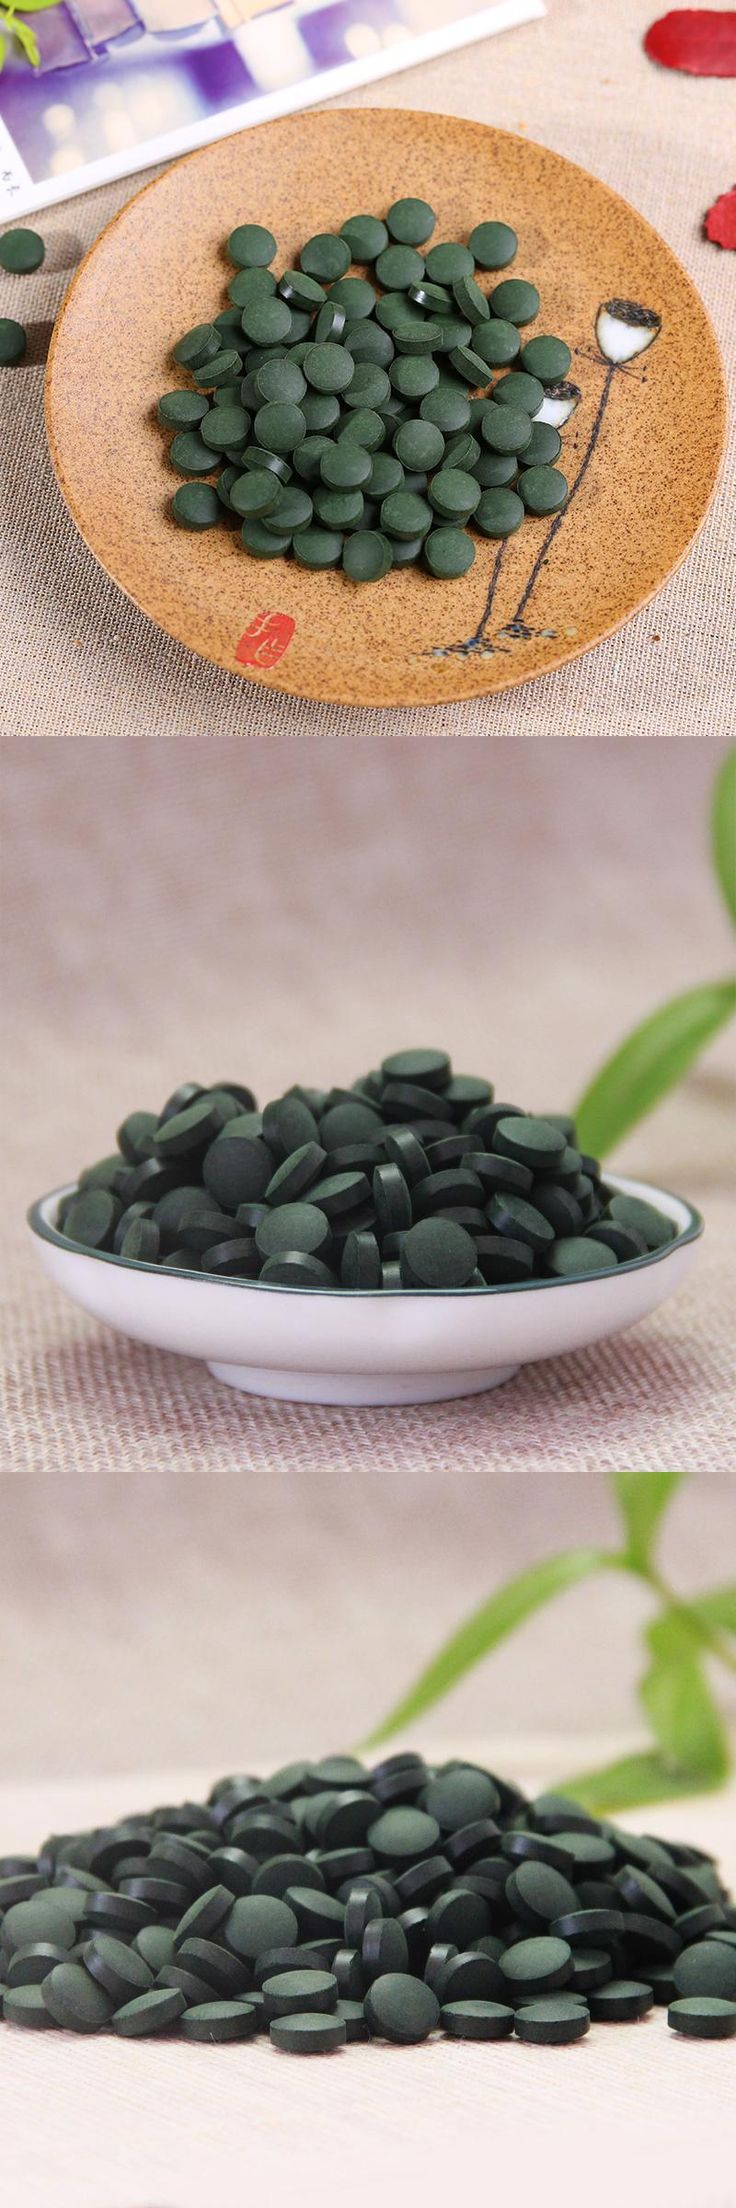 [Visit to Buy] Health Food 1000 Pills Quality Approved Anti-fatigue Anti-radiation Enhance-immune 250g Green Natural Spirulina Health Tea #Advertisement